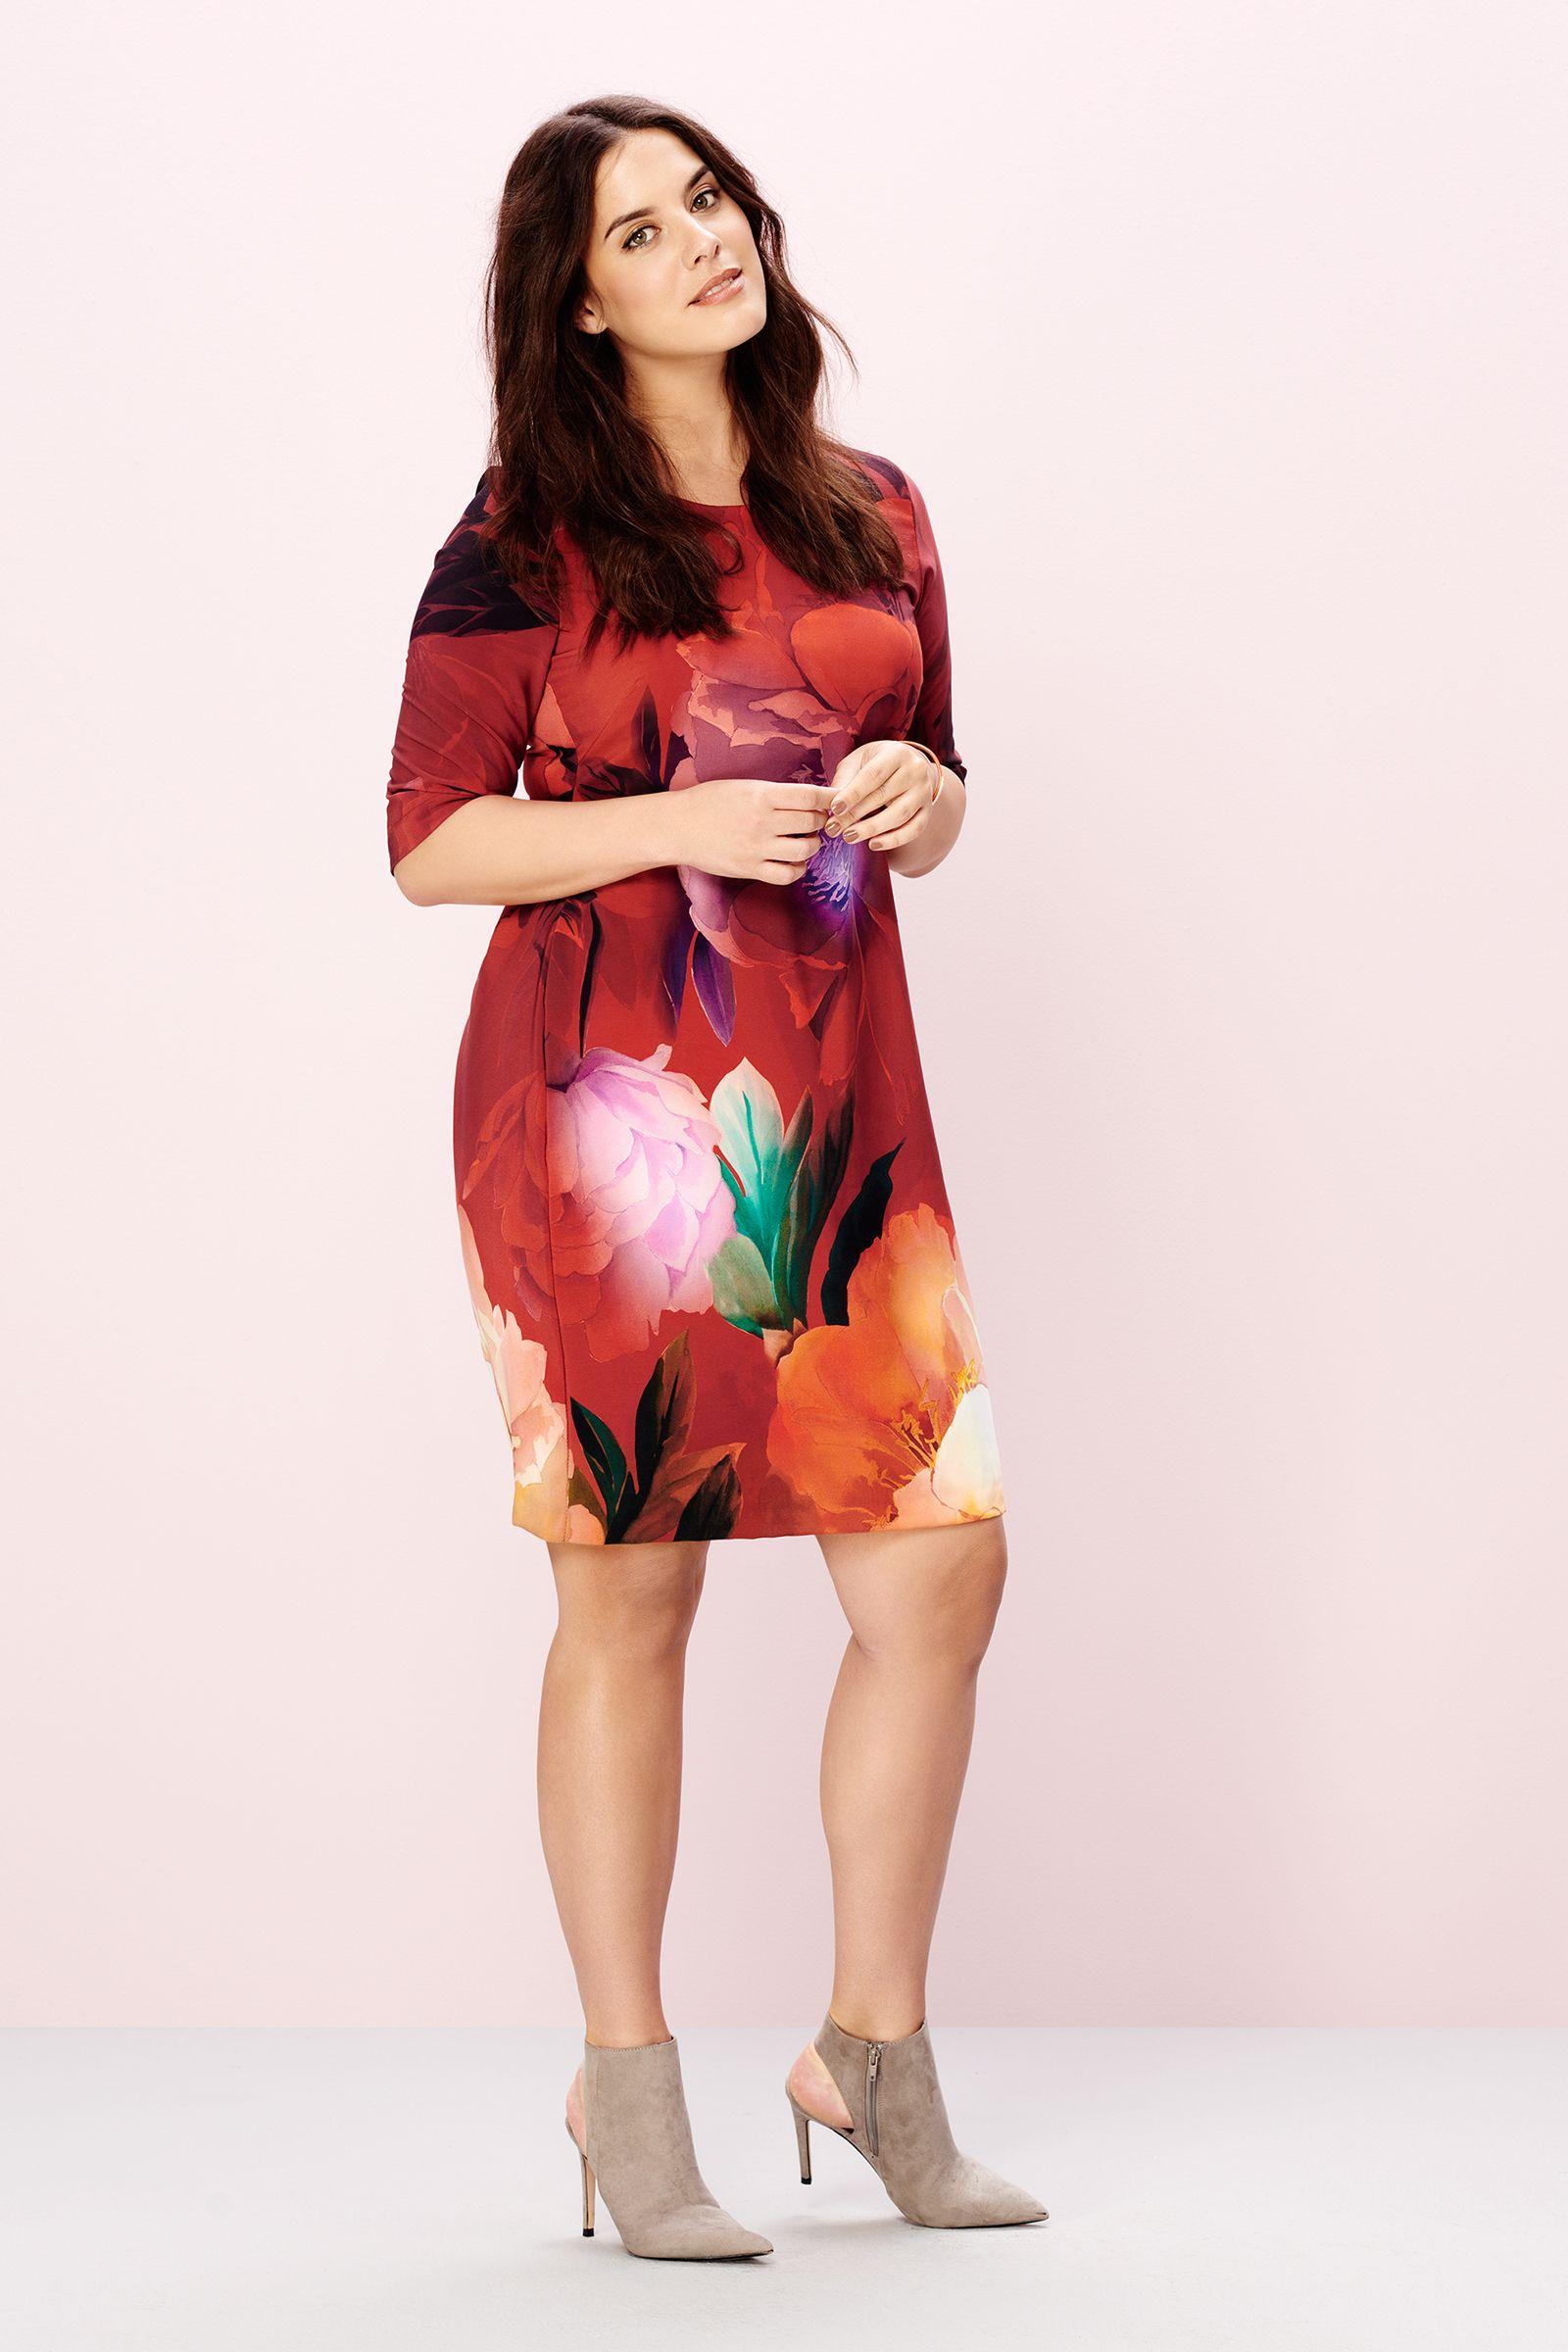 Red roses dress Plus Size Dress (Curvy Fashion)